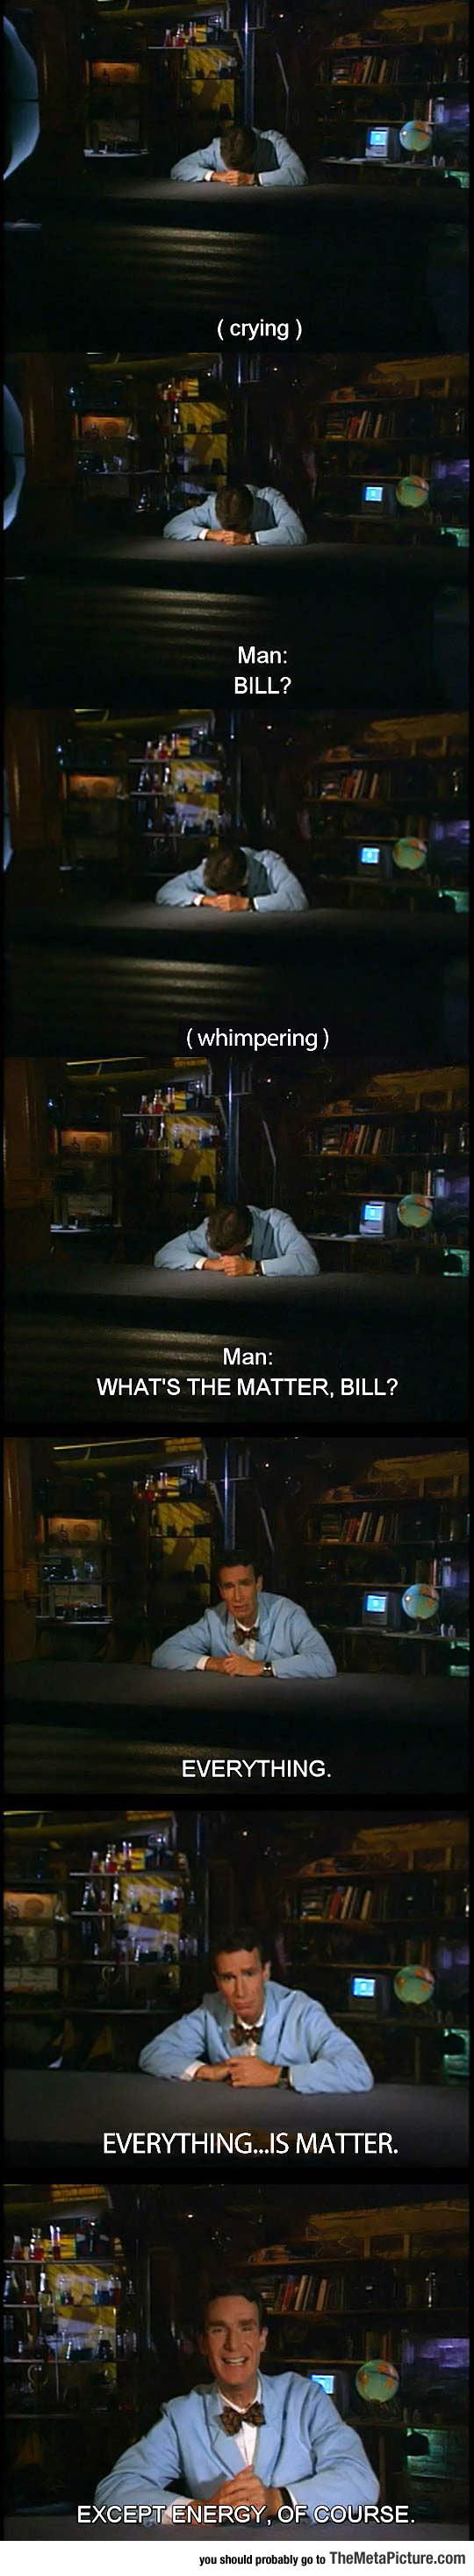 Hey Bill, What